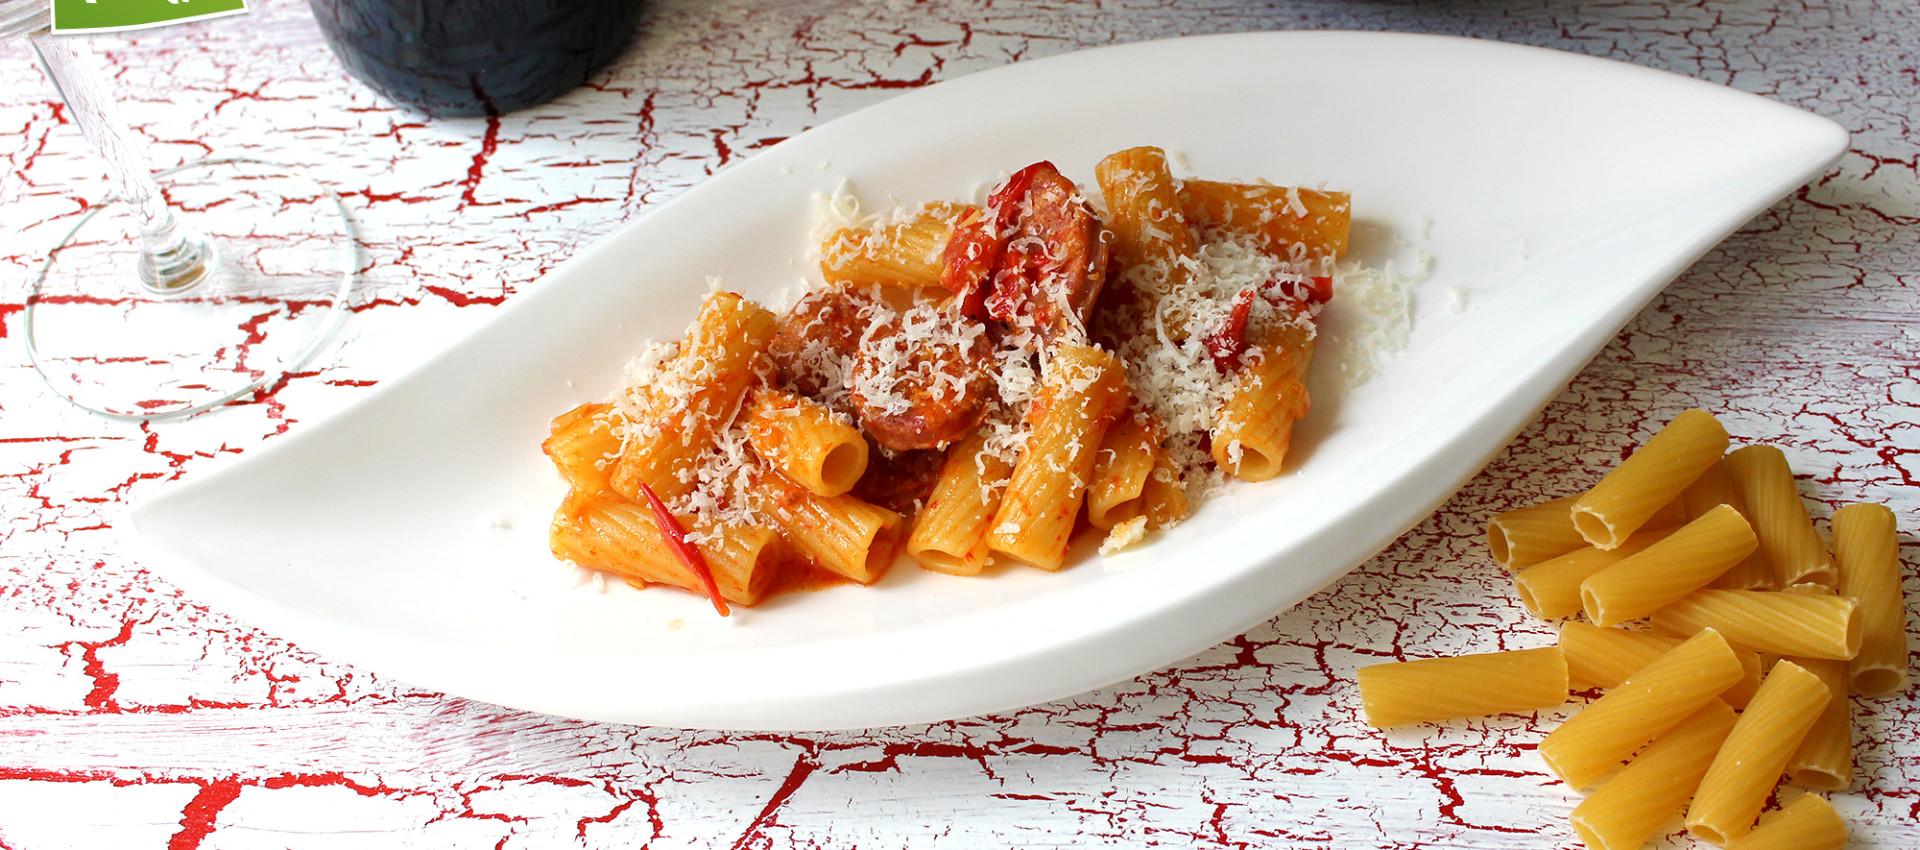 Rezept Pasta mit Salsiccia & Paprikasauce von KochBock.de